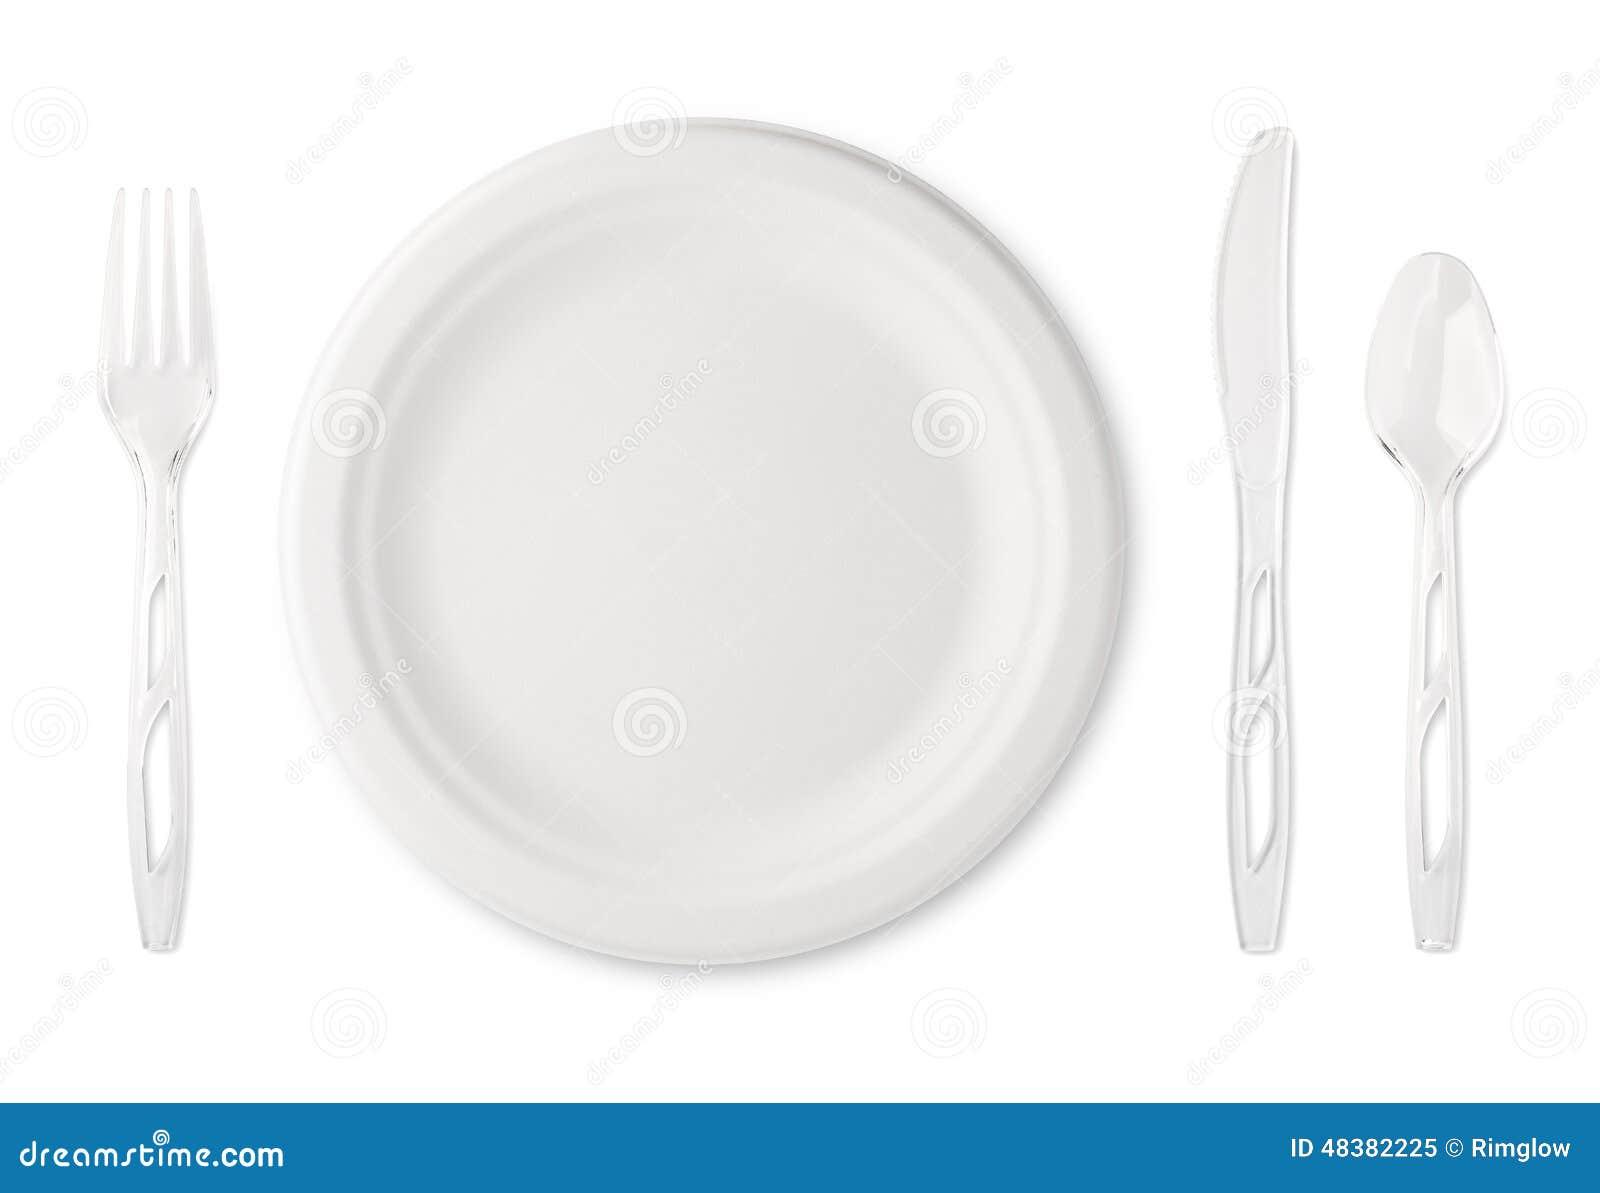 how to clean raw chicken utensils